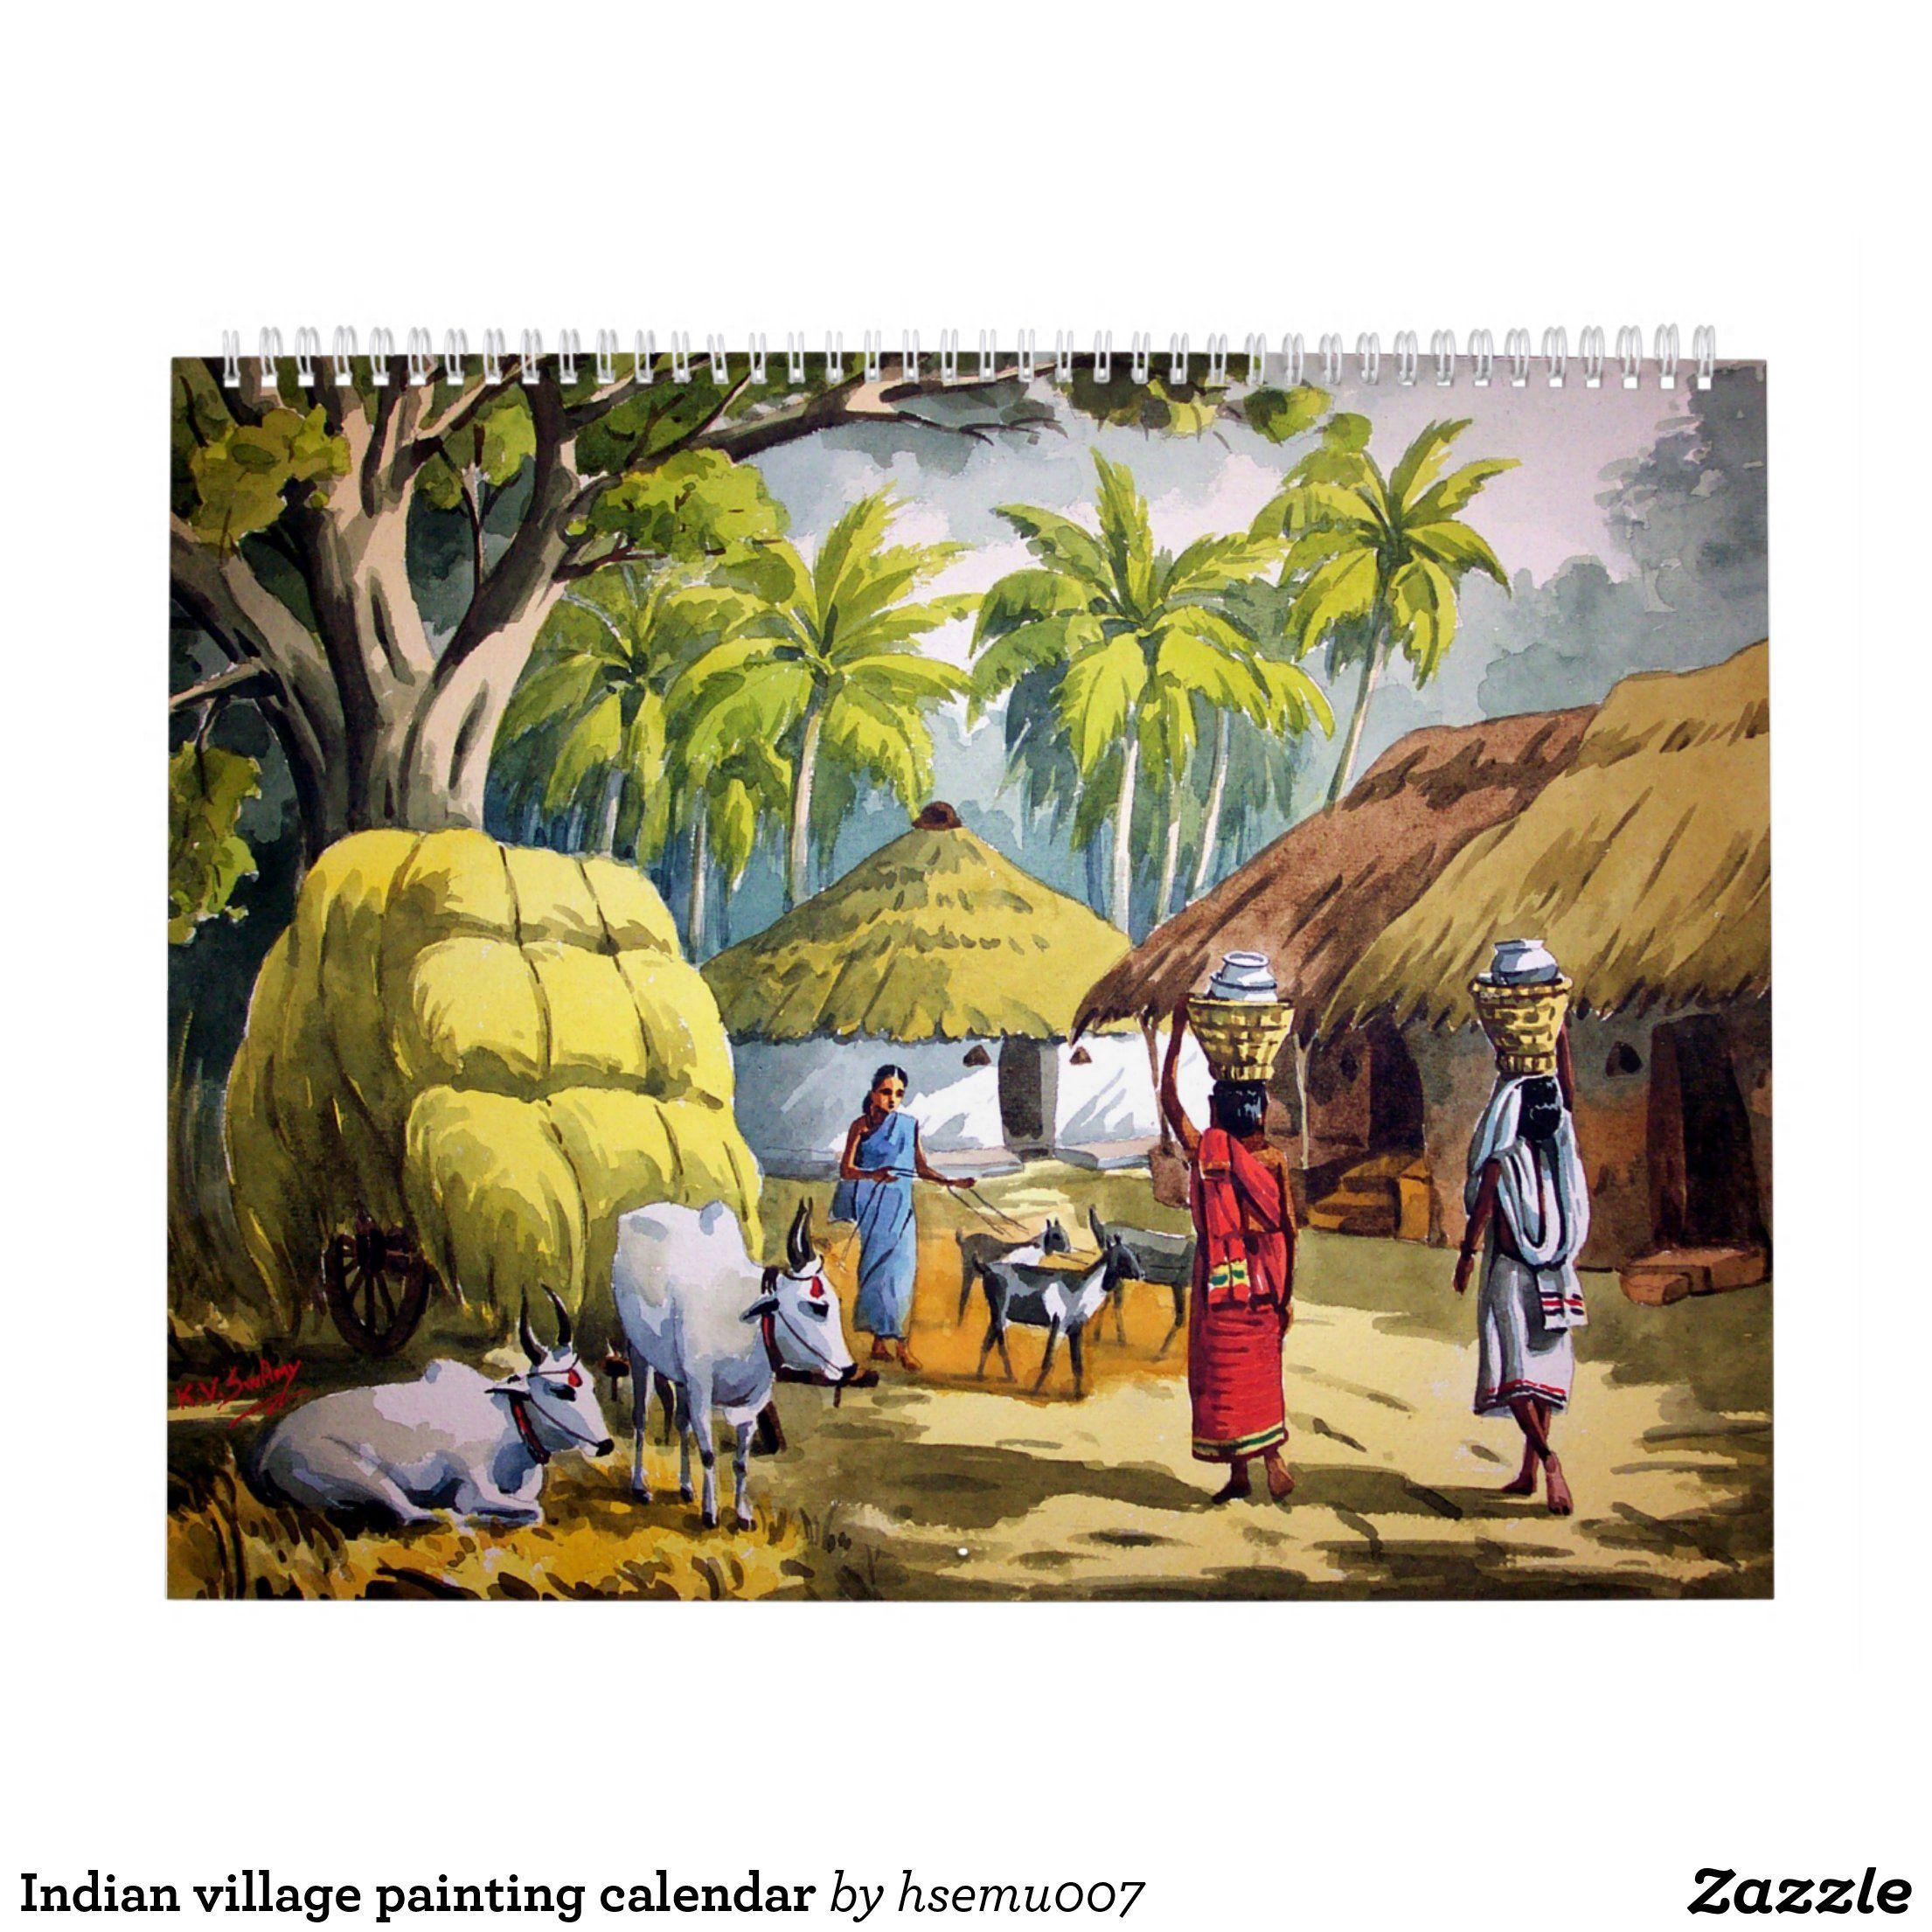 Indian Village Painting Calendar Zazzle Com In 2020 Art Village Village Scene Drawing India Painting